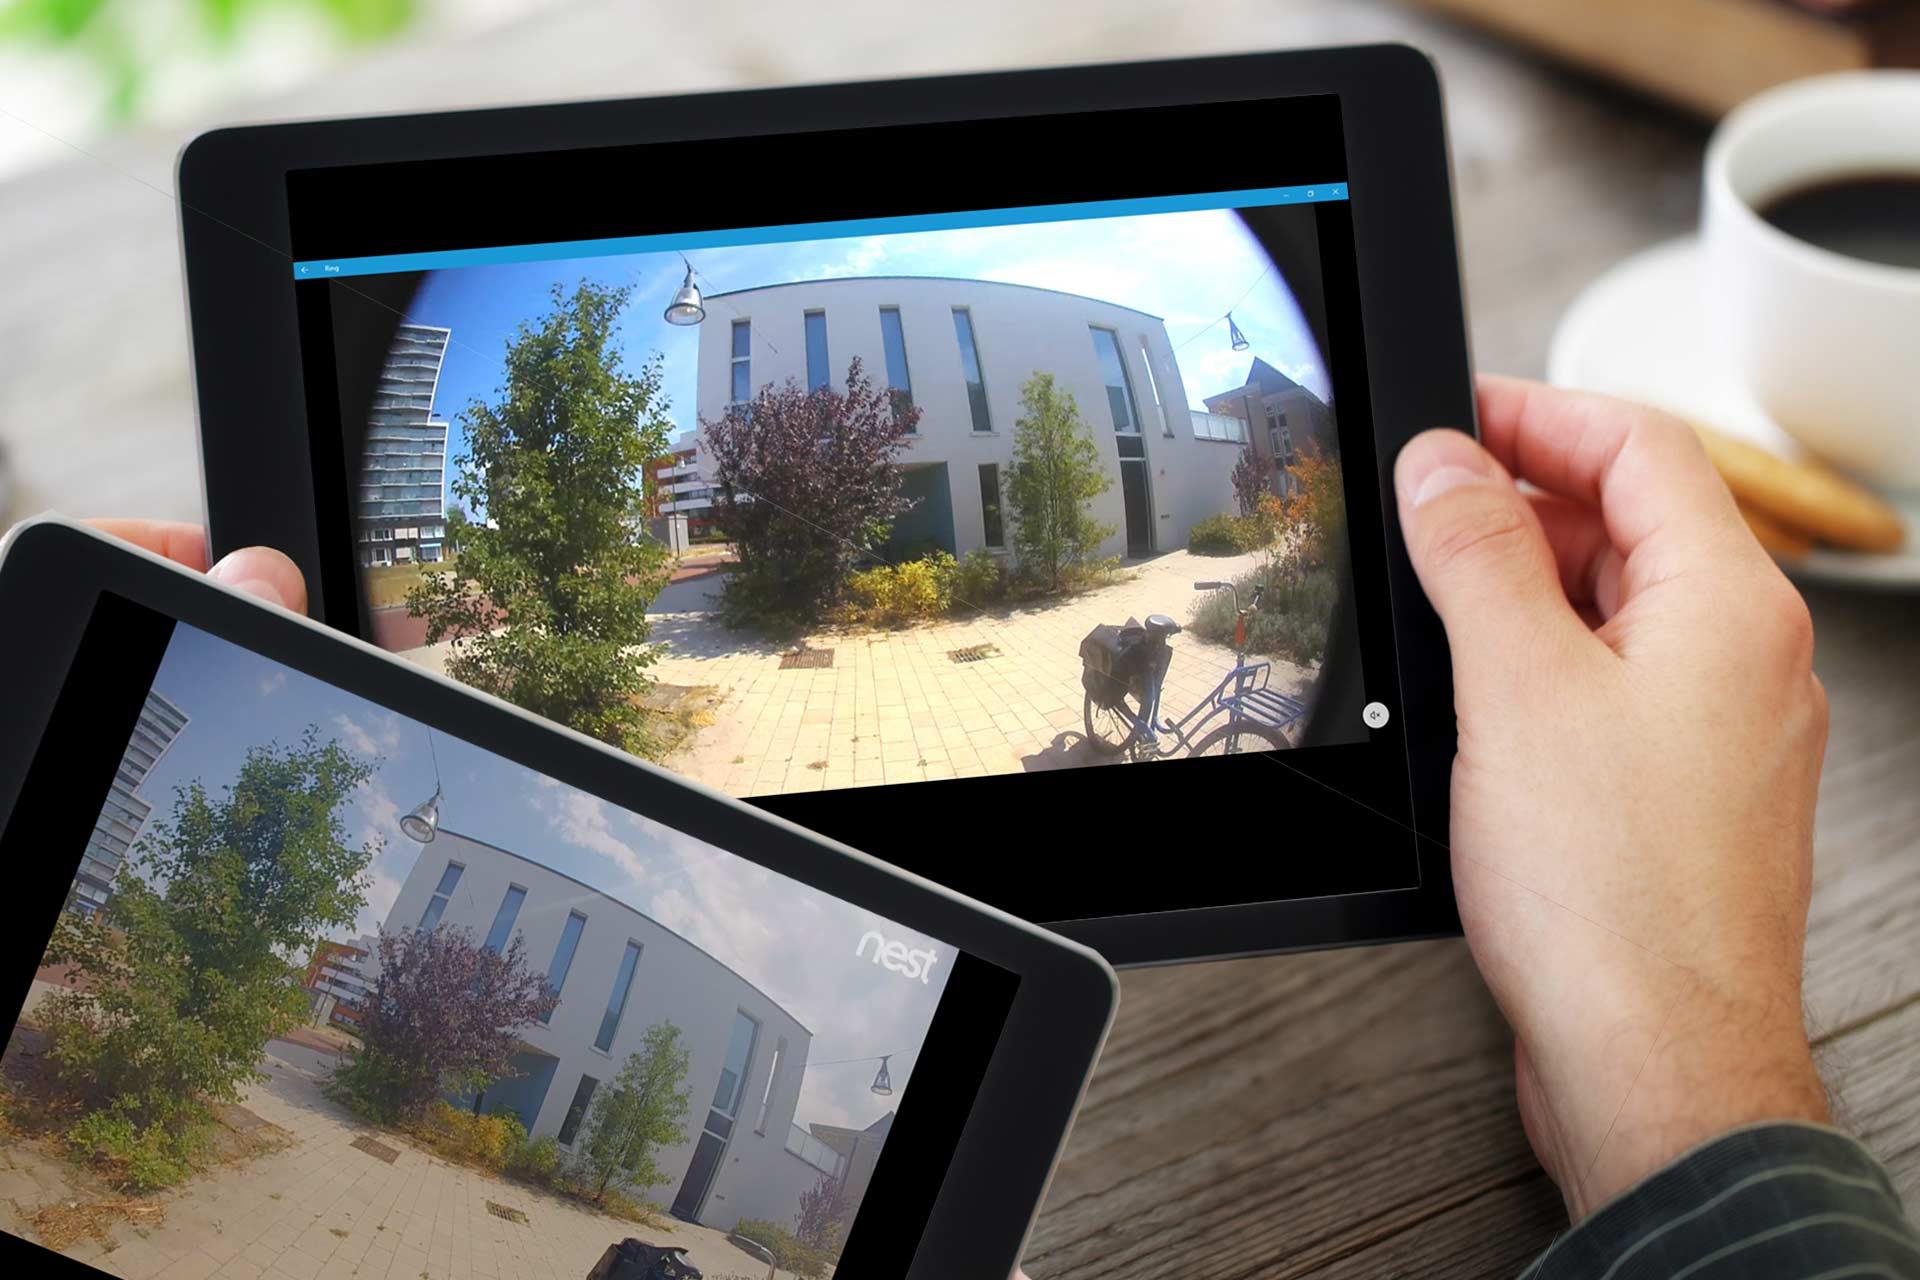 camera-beeld-2a-tablets